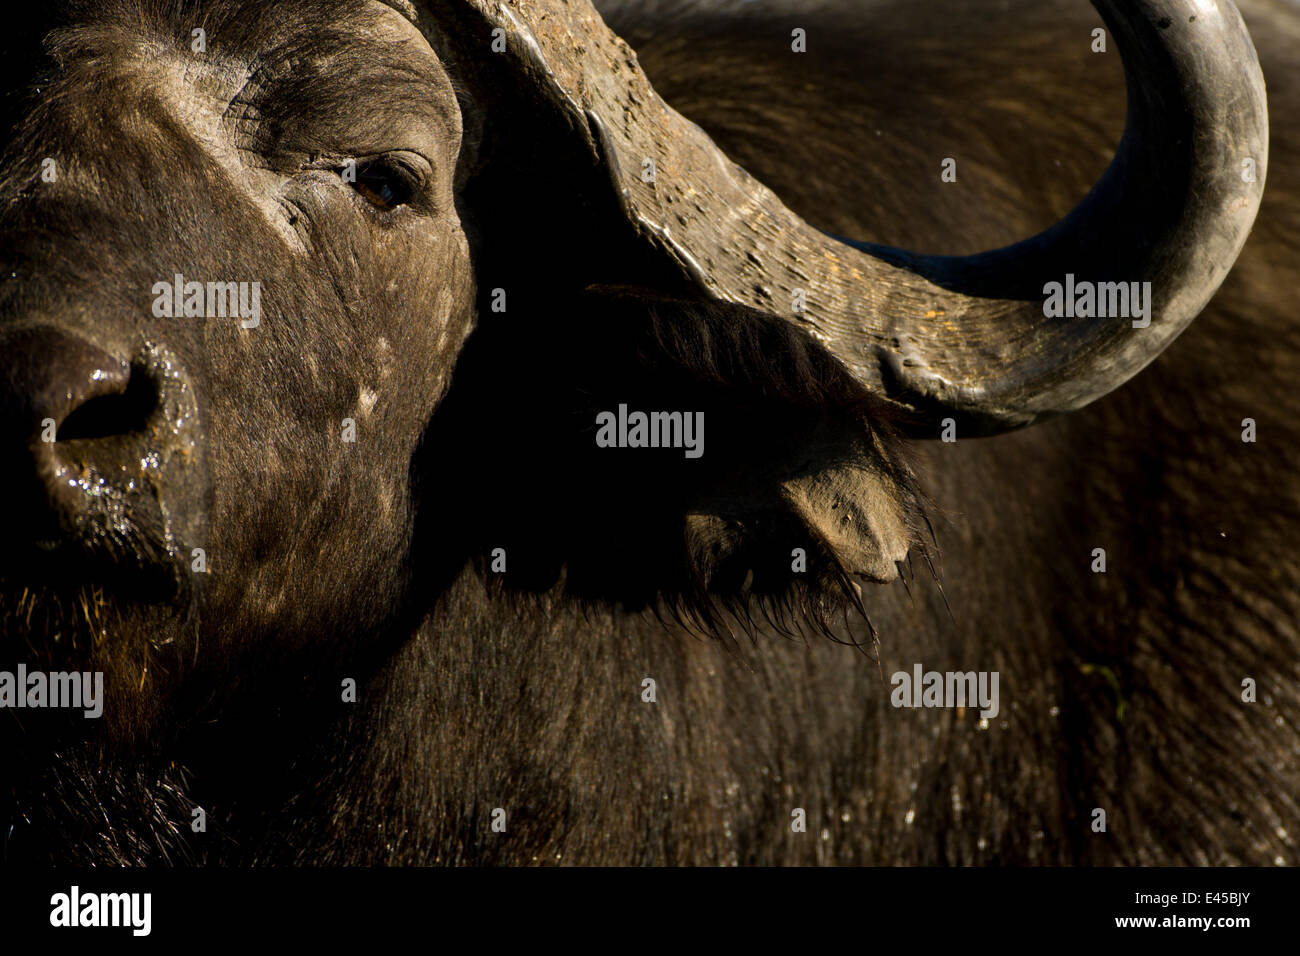 Male African / Cape Buffalo (Syncerus caffer) Okavango Delta, Botswana. - Stock Image